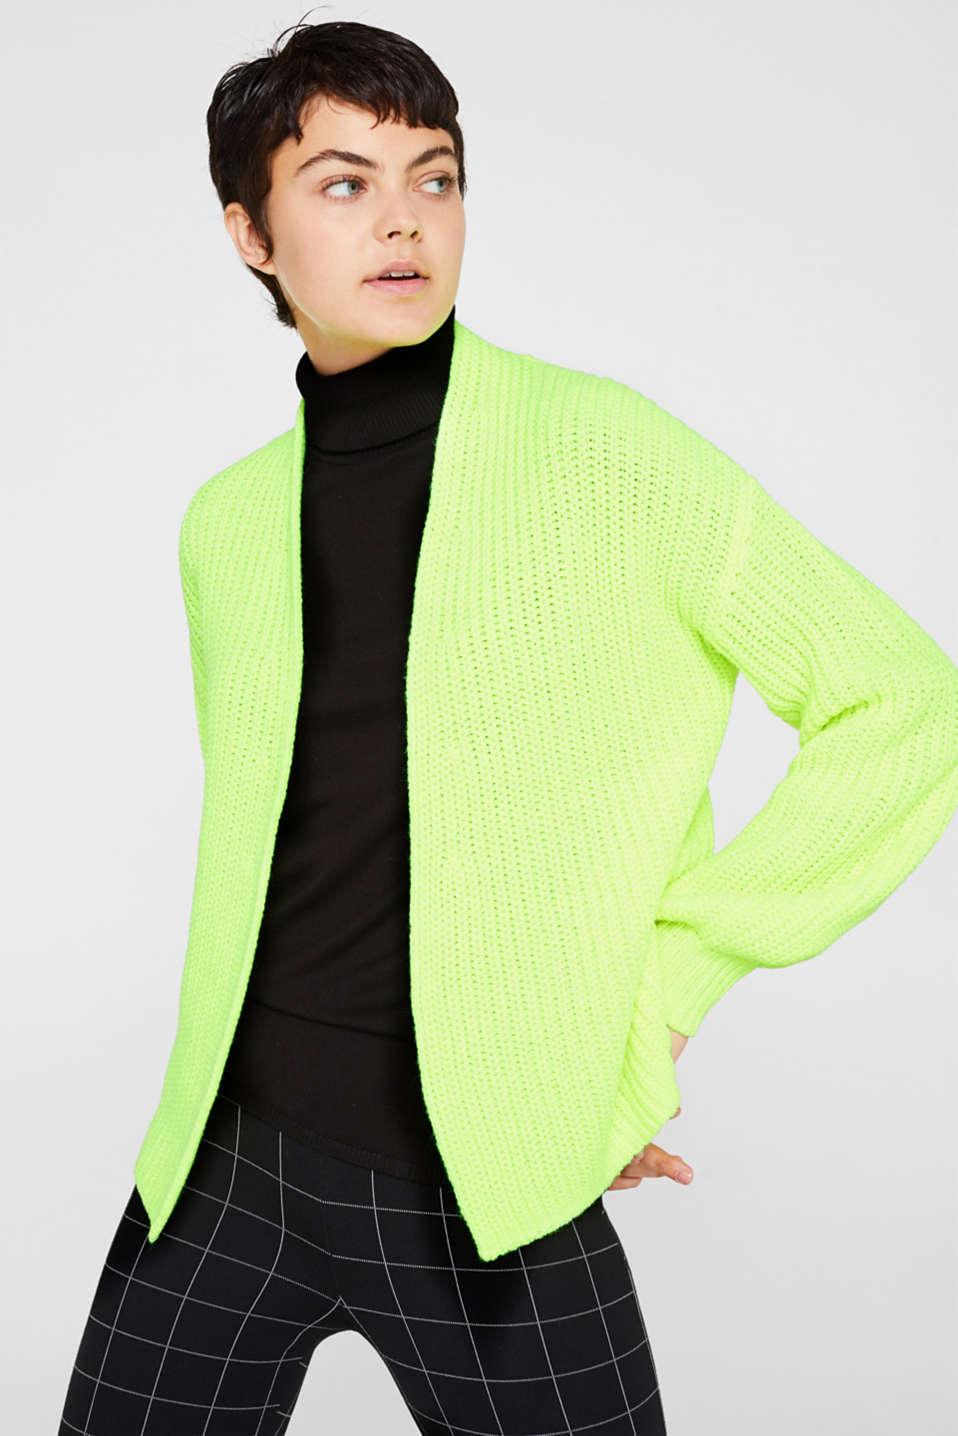 Open rib knit NEON cardigan, PASTEL YELLOW, detail image number 0